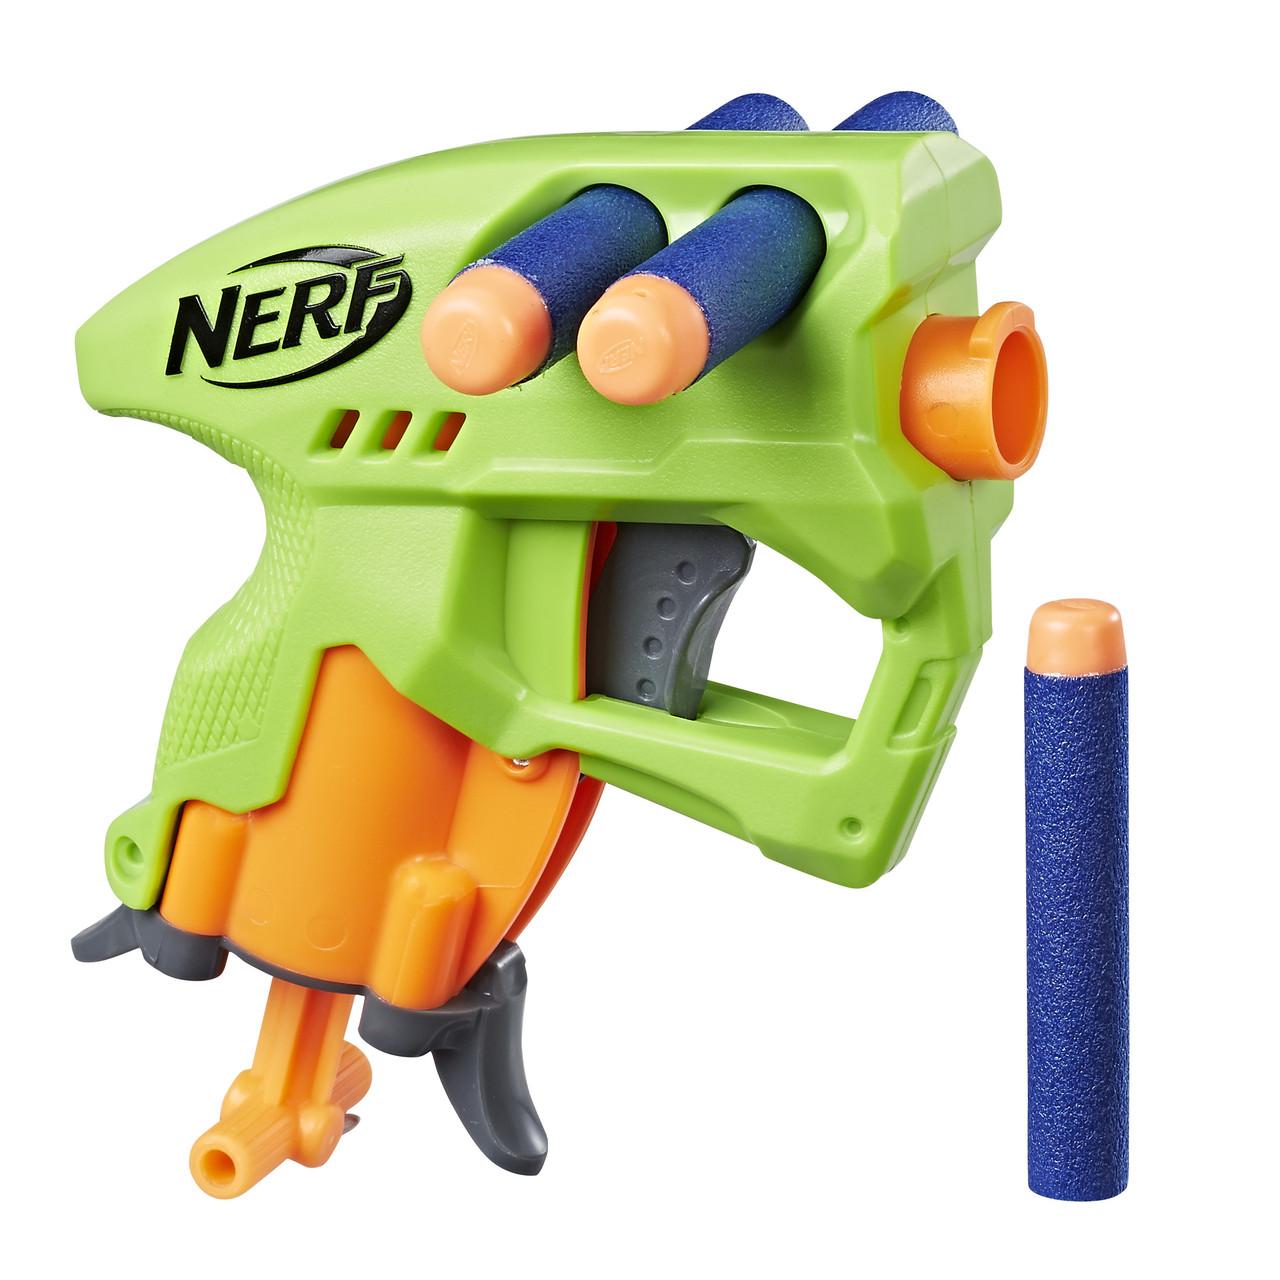 "Бластер Hasbro, Нёрф, Елит, Нанофайр зеленый - Hasbro, Nerf, ""N-Strike Elite"", Nanofire Green"